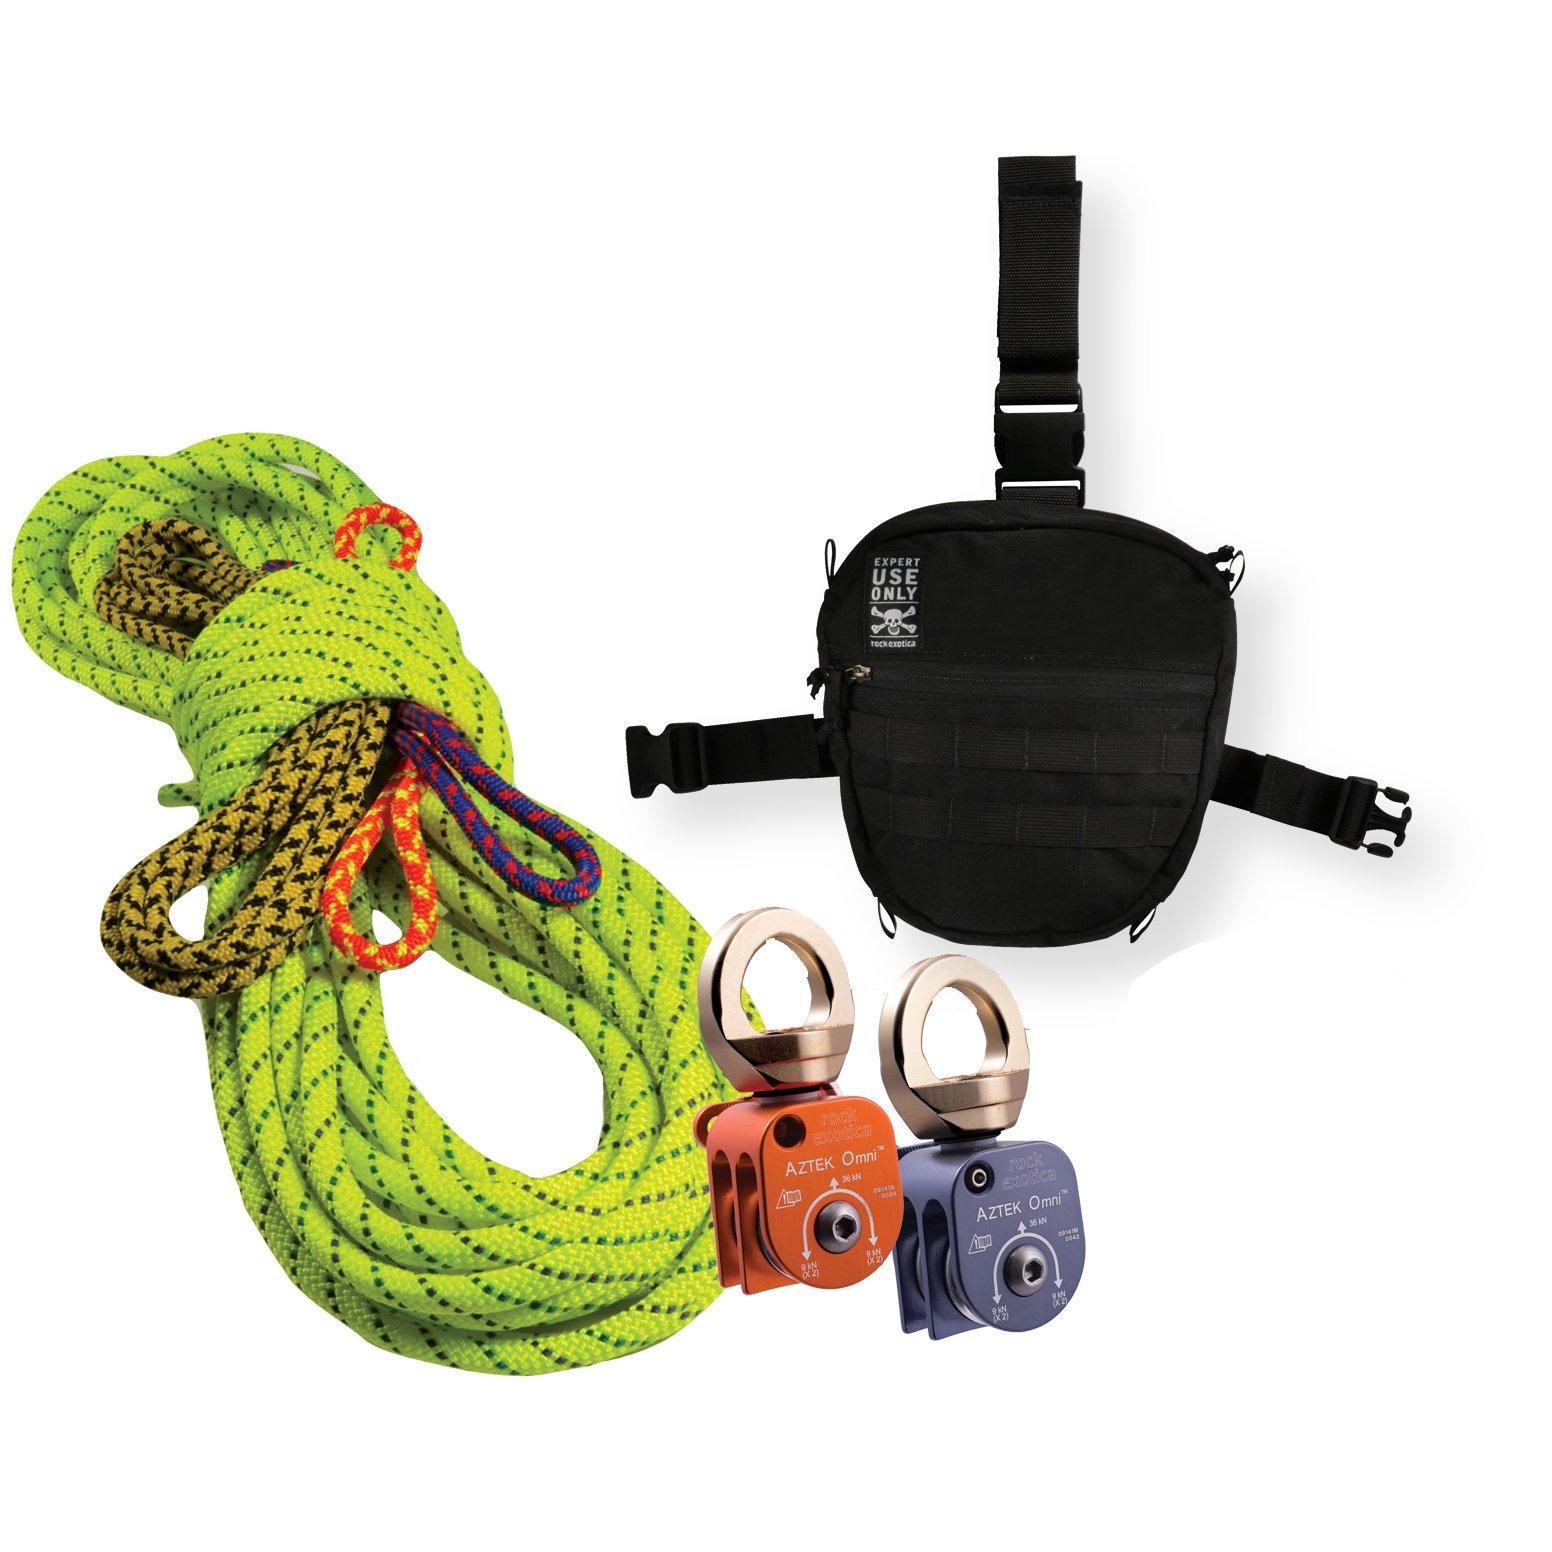 Rock Exotica Aztek Pulley Pro Kit P41KITPRO Plus 2 FREE Auto Bilock Carabiners